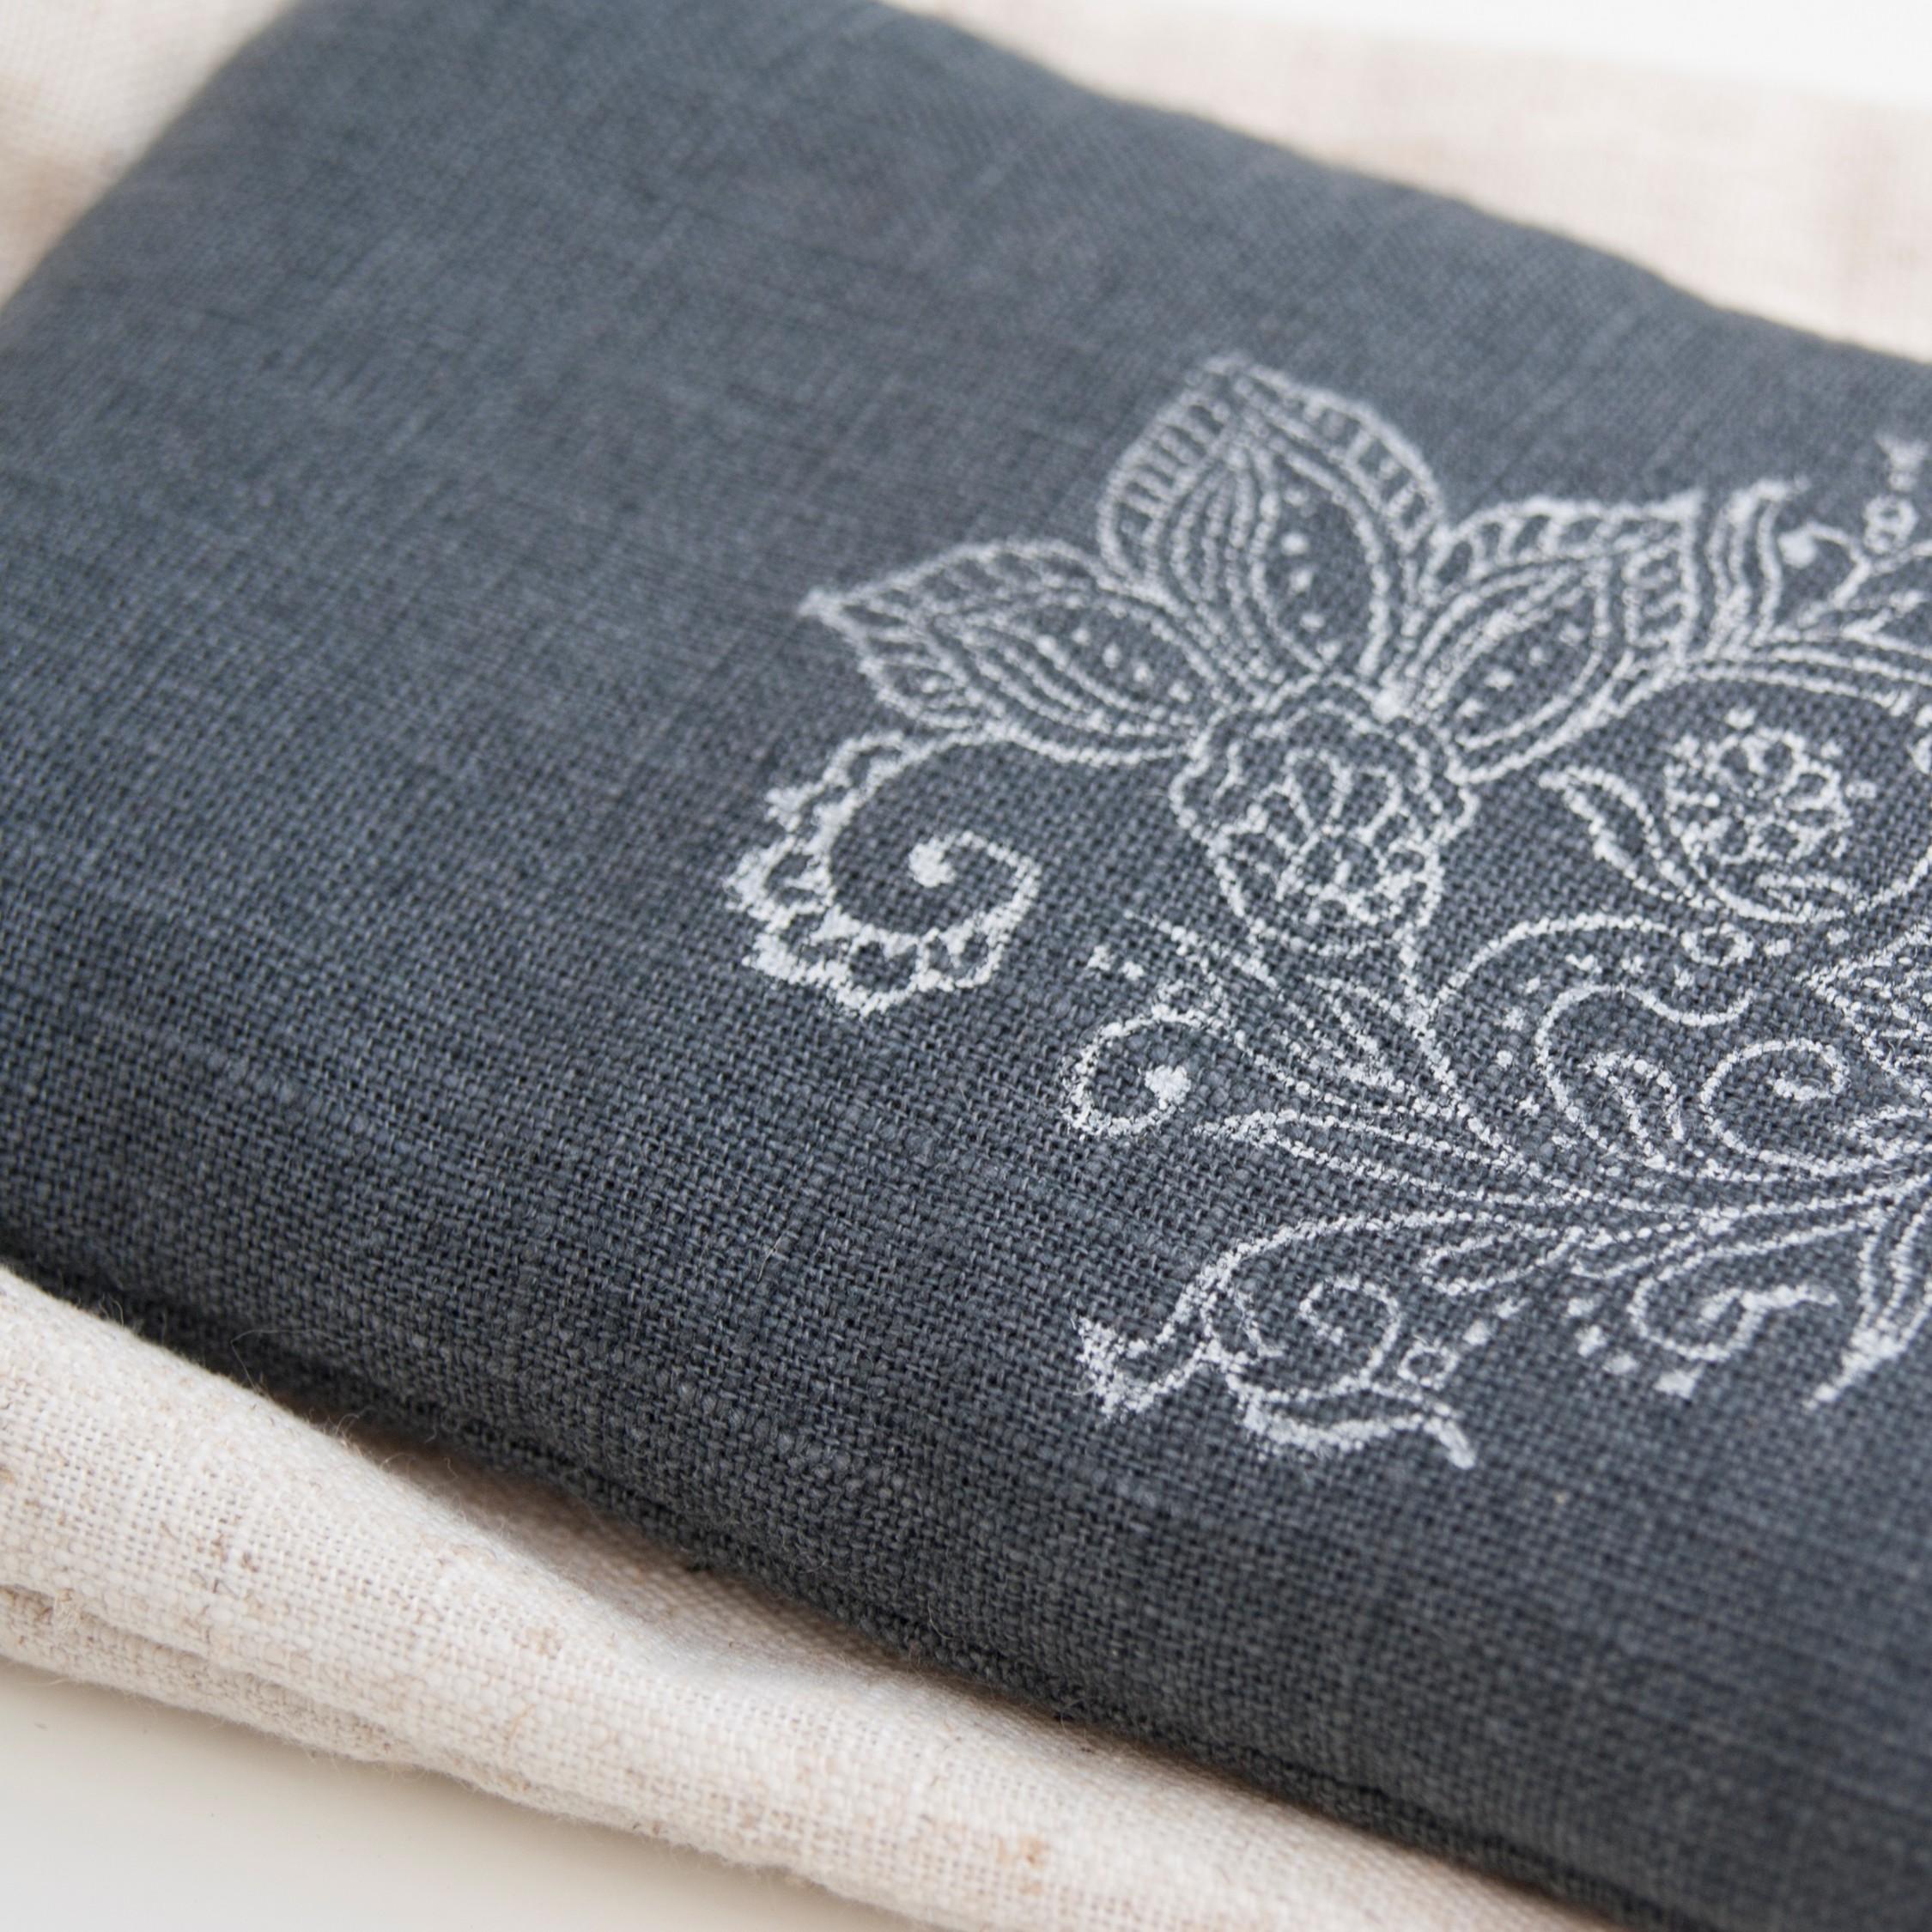 Yoga eye pillow in dark gray linen